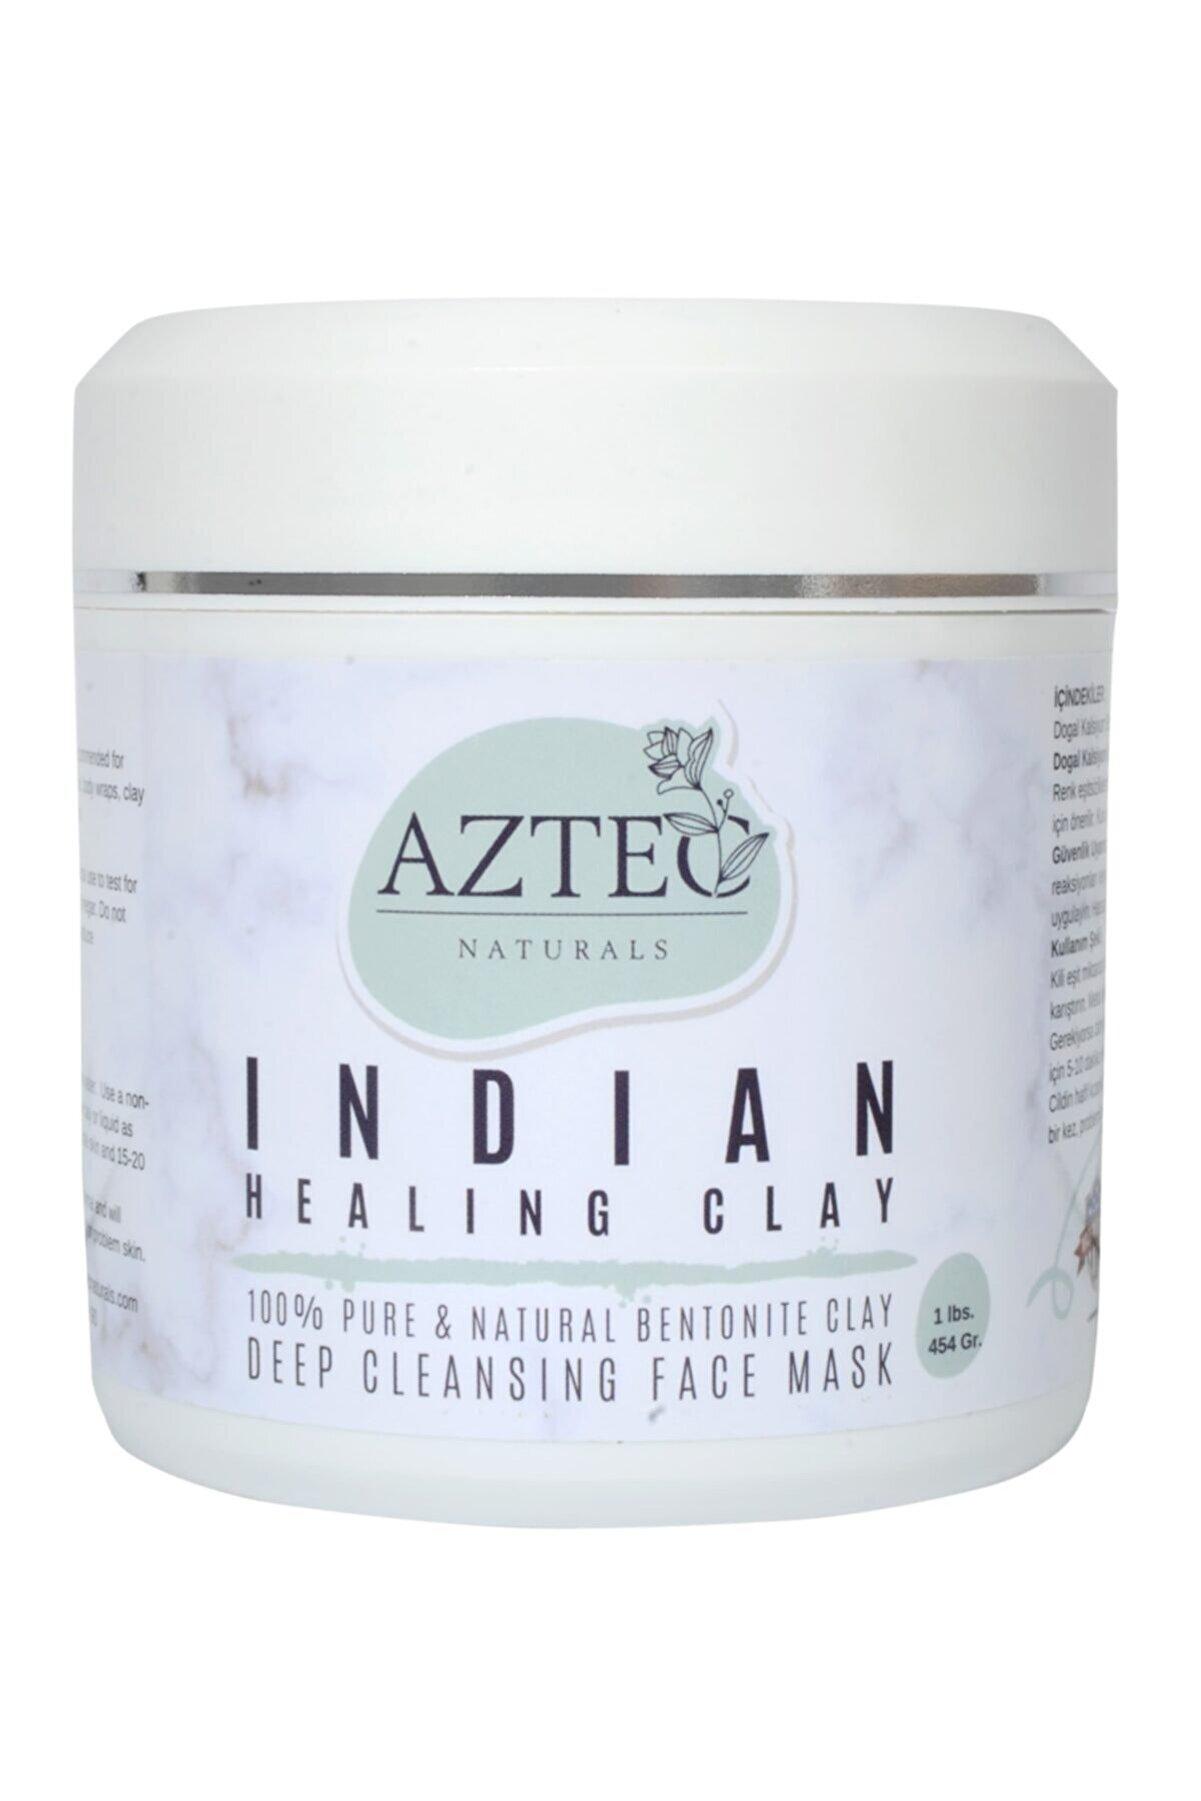 Aztec Naturals Kil Maskesi Indian Healing Clay Yüz Maskesi 454 Gr.